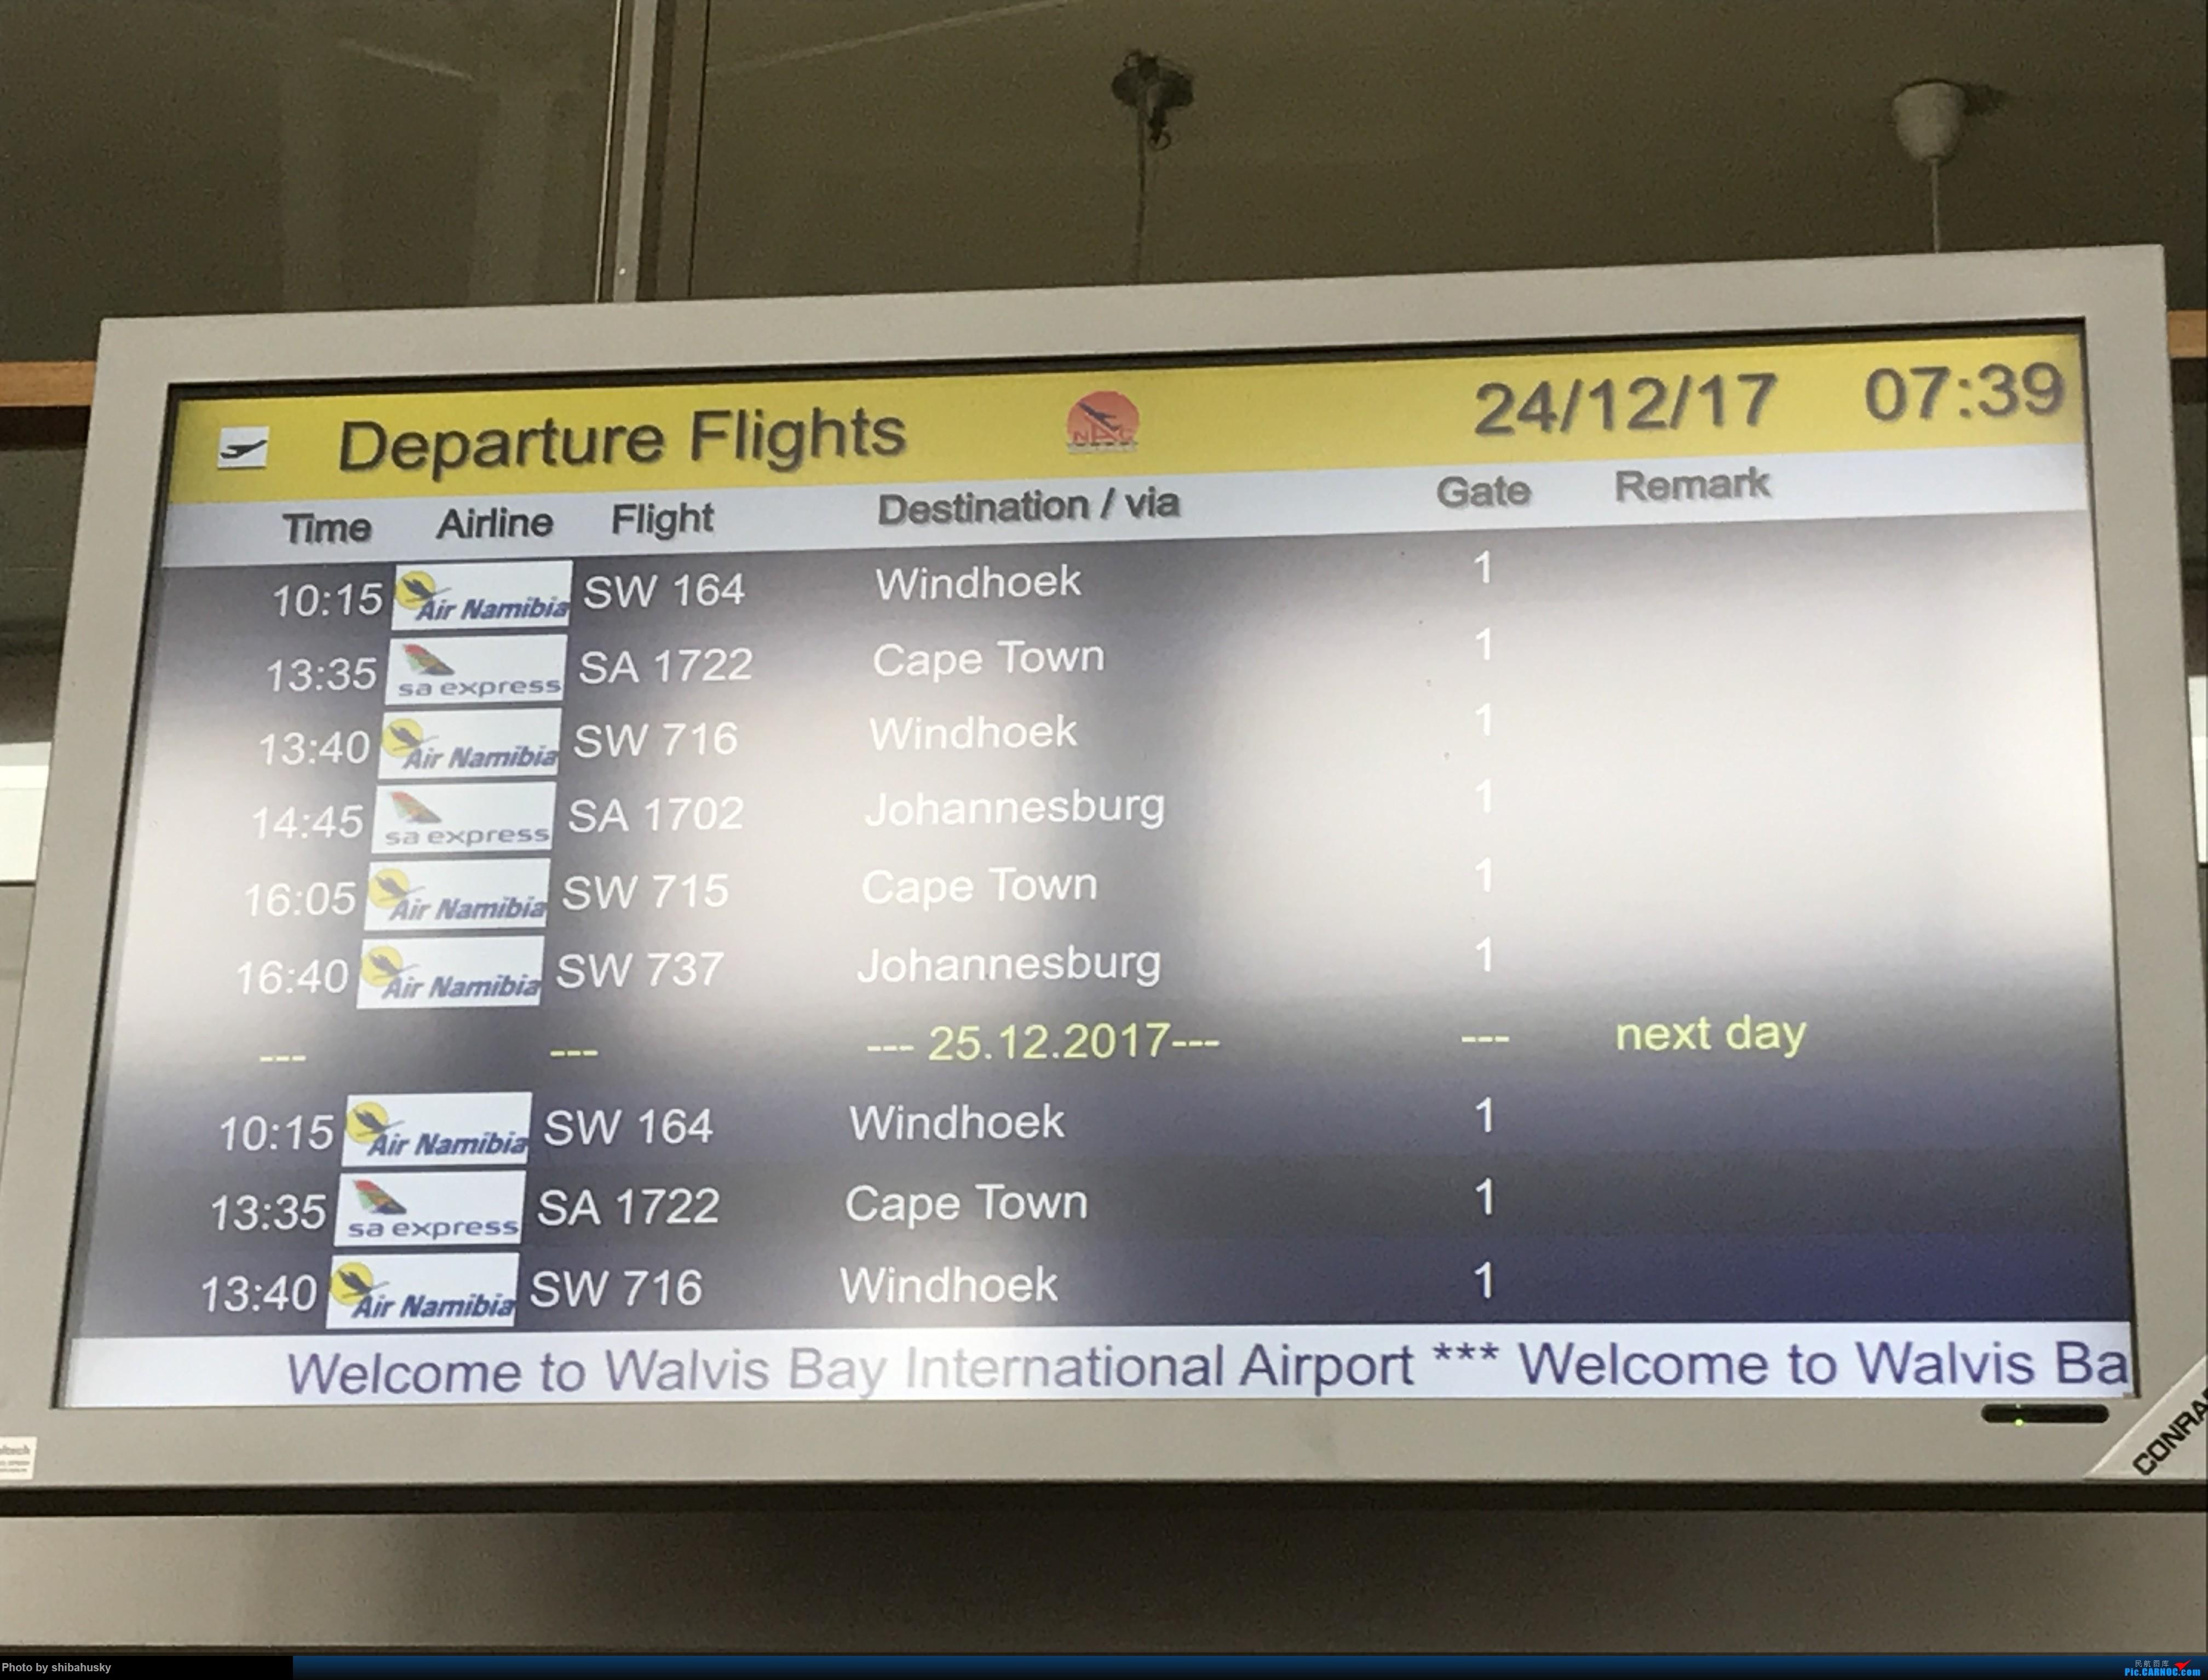 Re:[原创]新人第一帖 WVB-WDH-DOH-CDG-SOU 圣诞纳米比亚游记 体验稀有机型加辗转回英